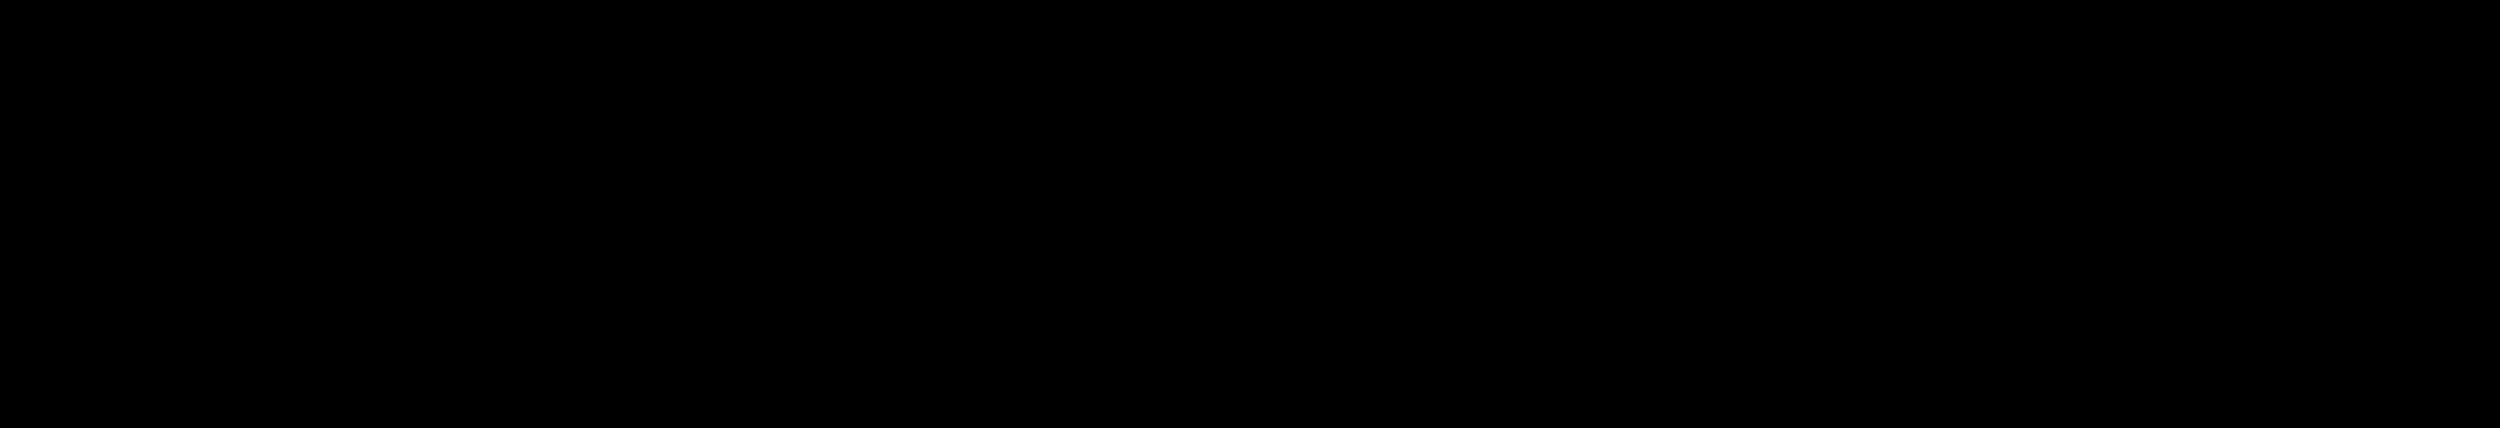 black-logo-long.png